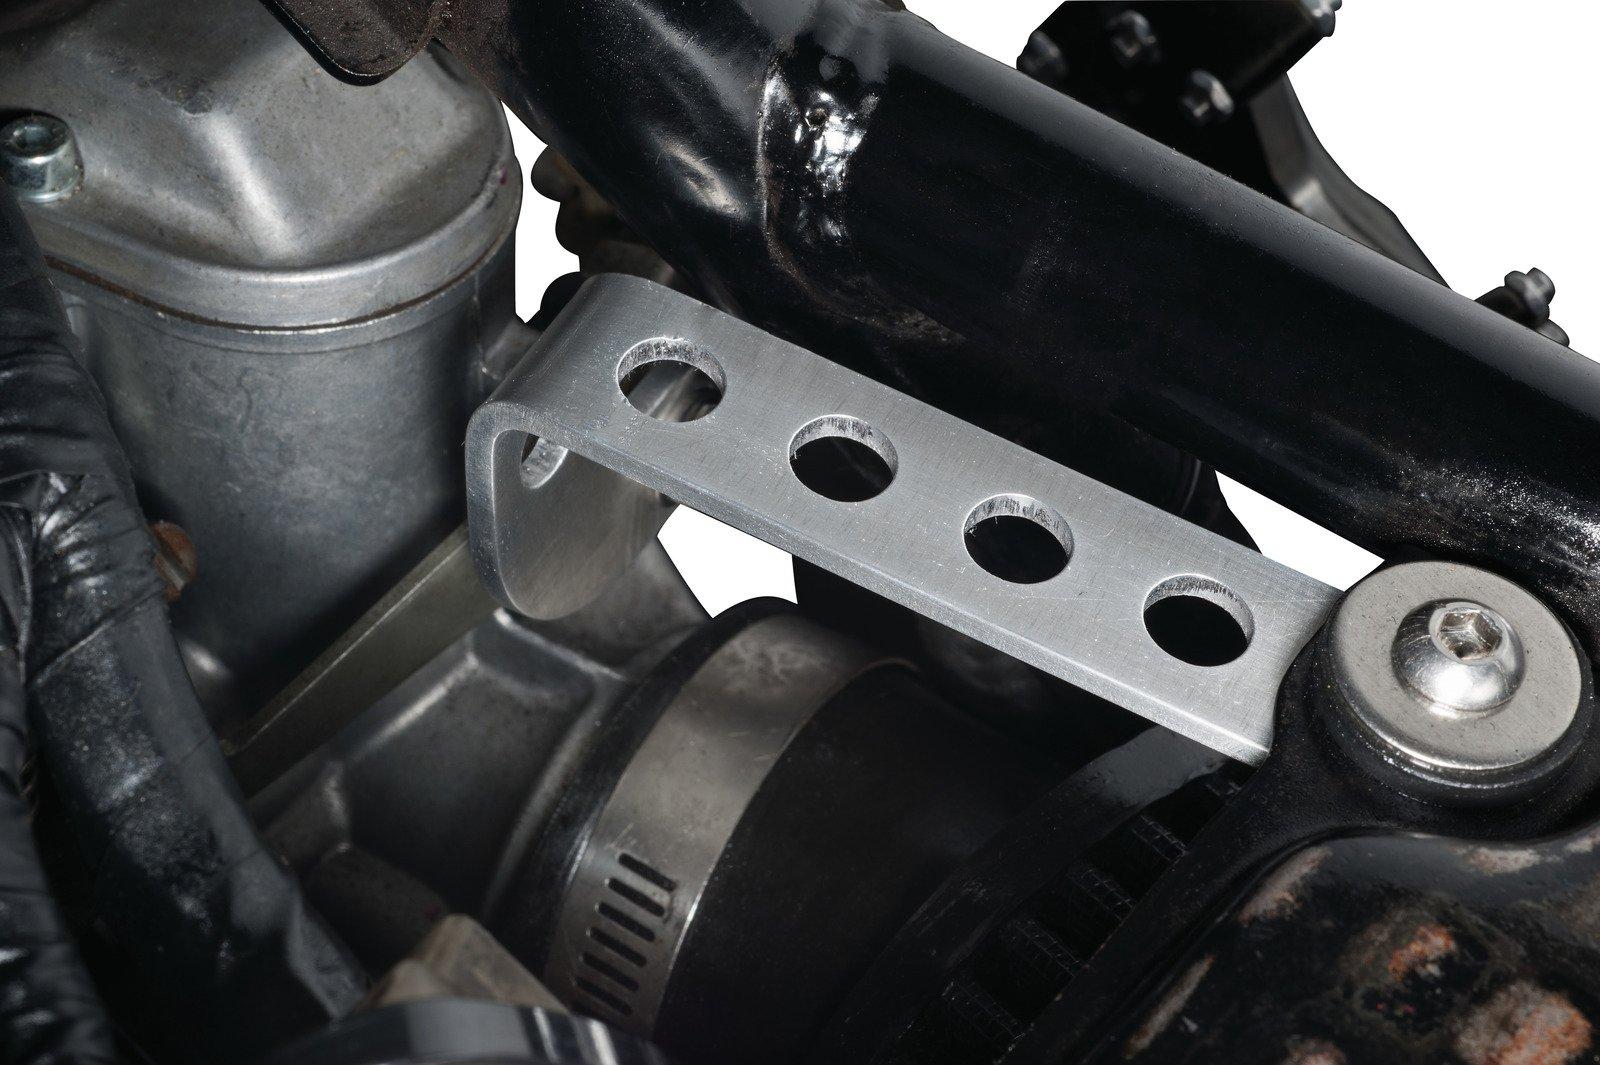 Stainless Steel Complete Carburetor Frame Mounting Kit for Yamaha SR500 VM34SS Carburetor and K&N Air Filter; Rubber-Cushioned